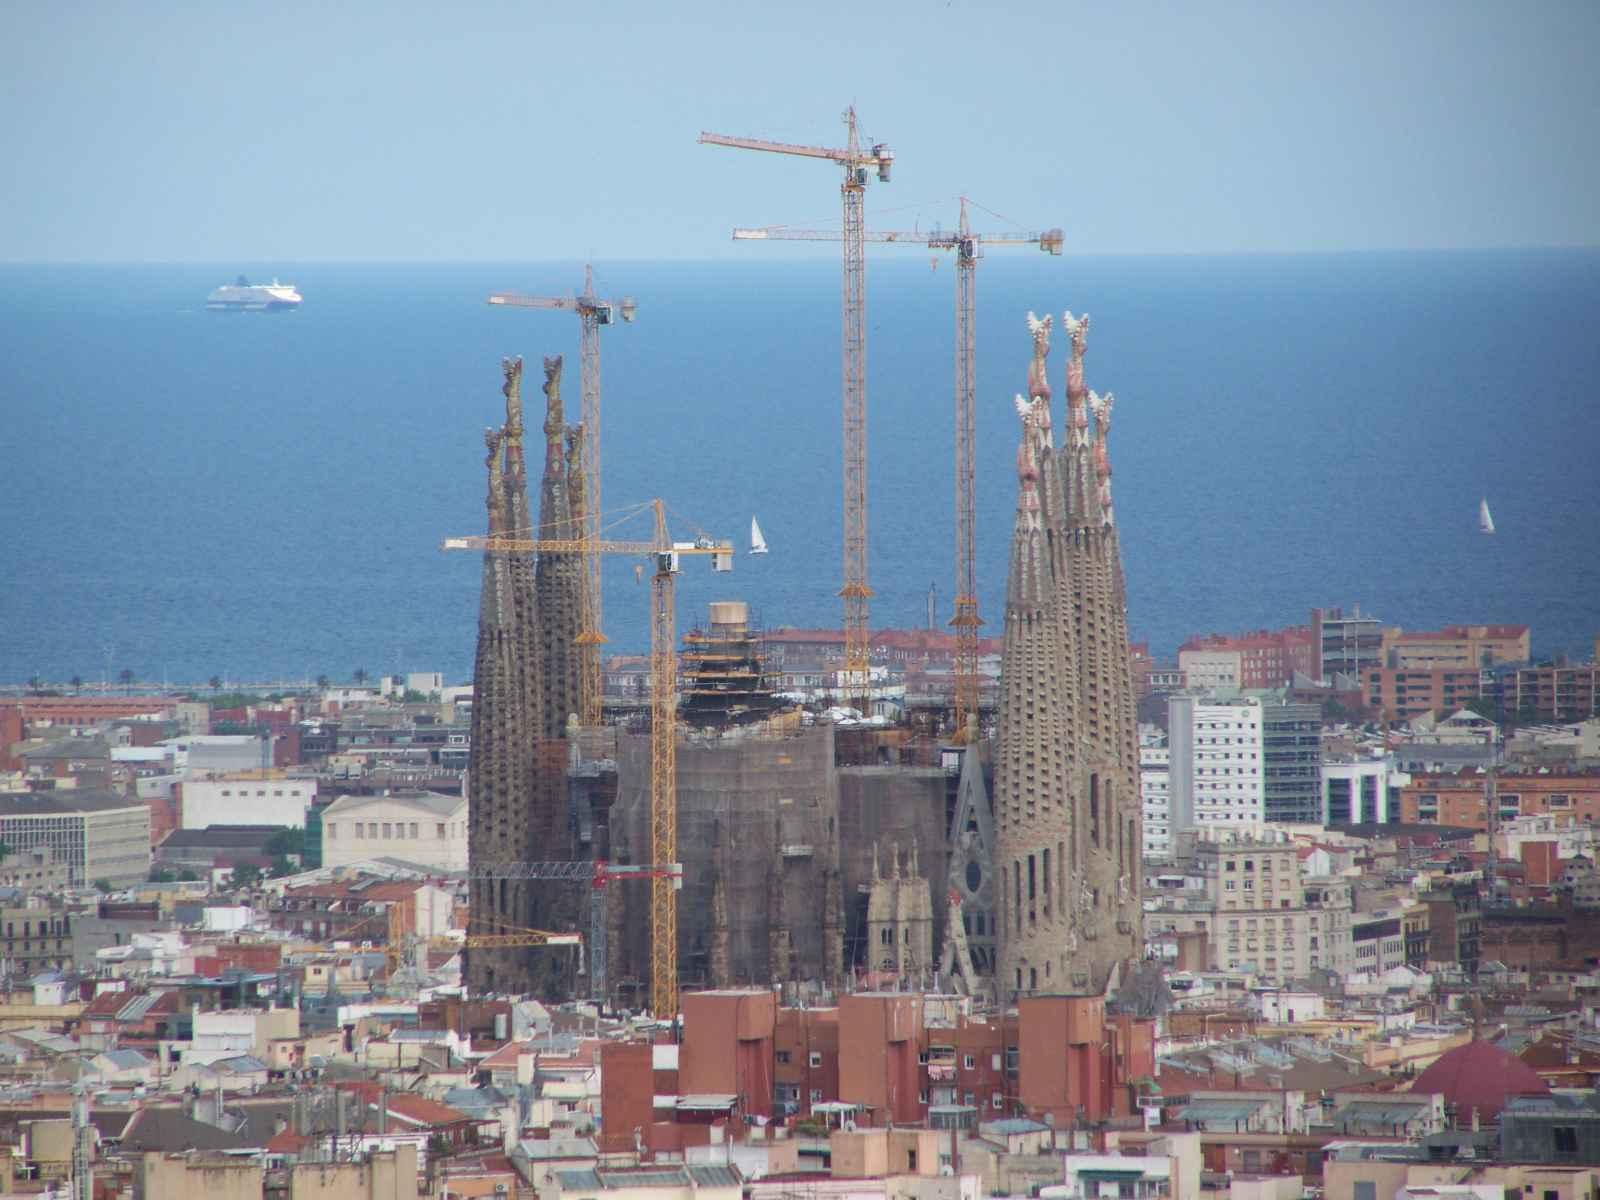 barcelona_2010_1600px_009